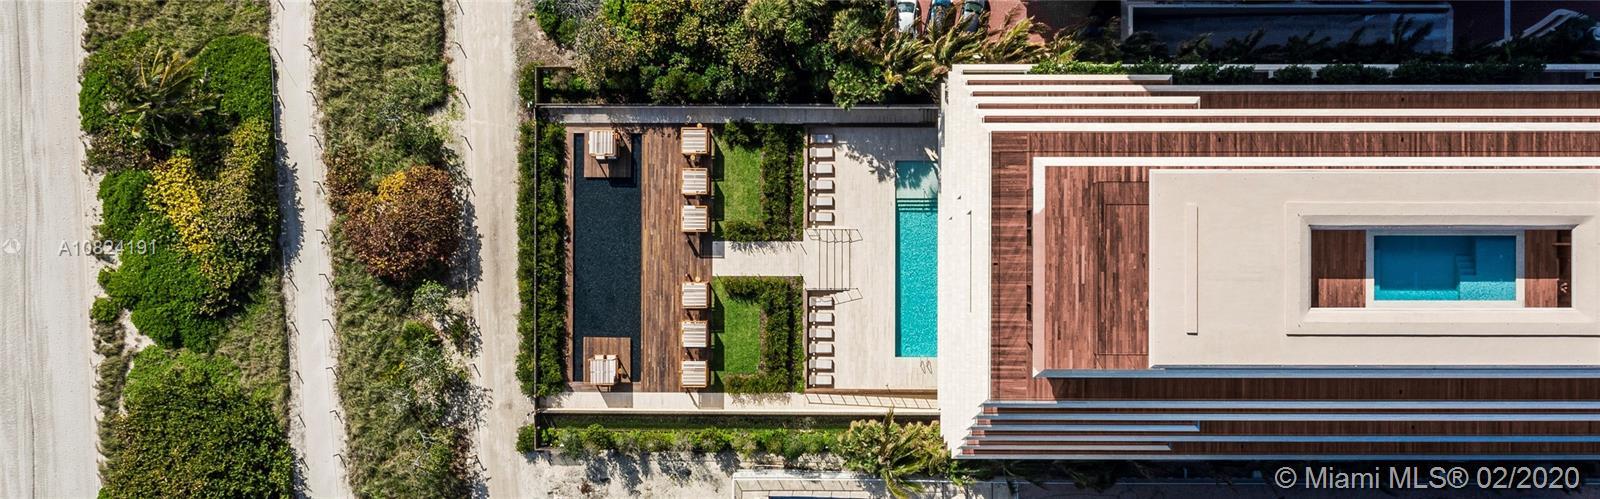 8955 Collins, Unit #501 Luxury Real Estate